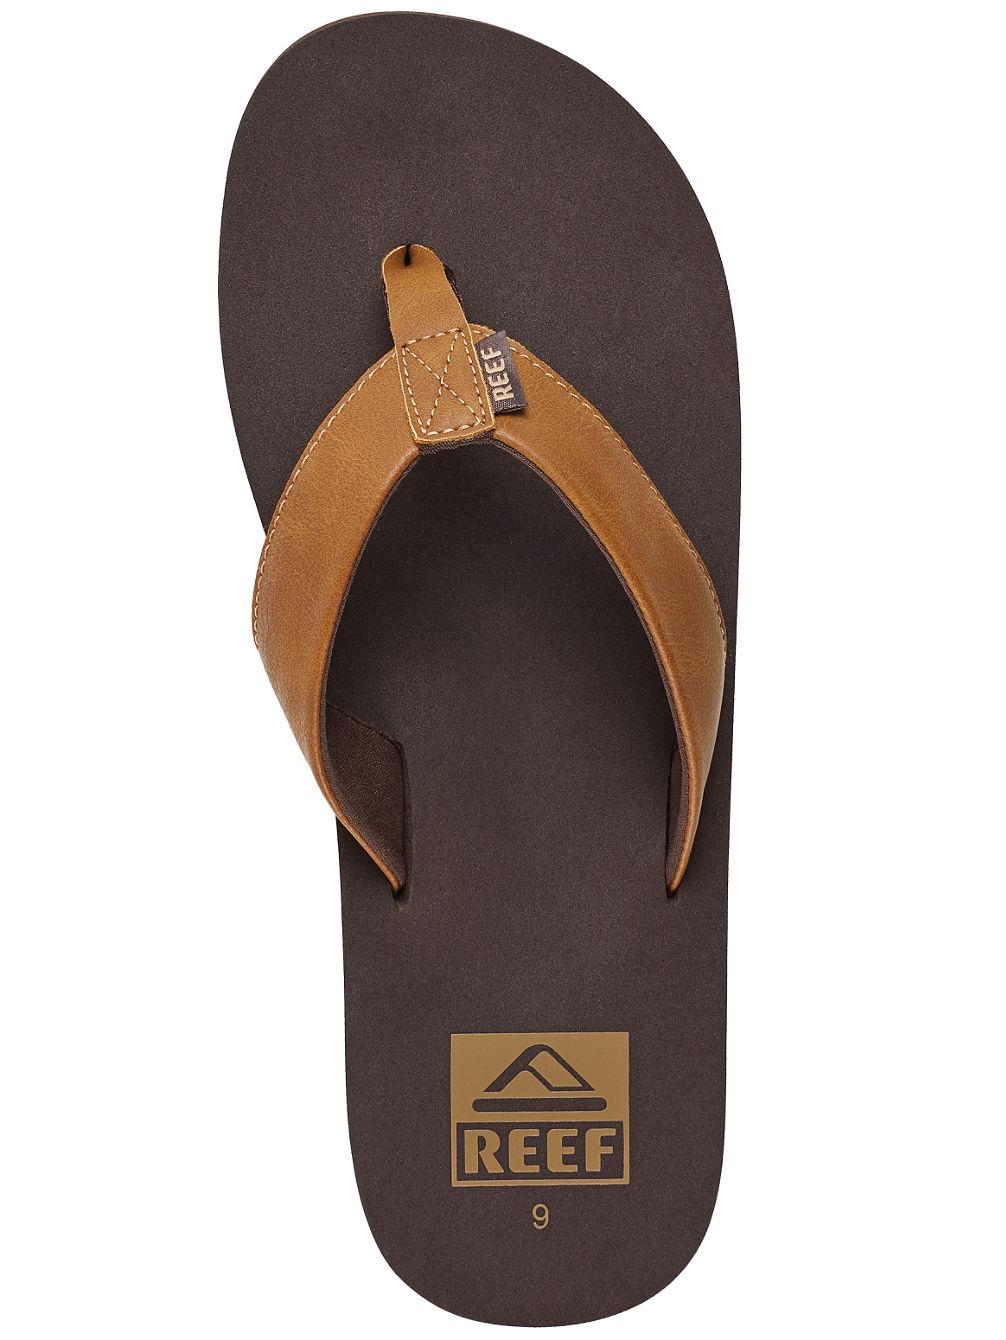 reef-twinpin-sandals